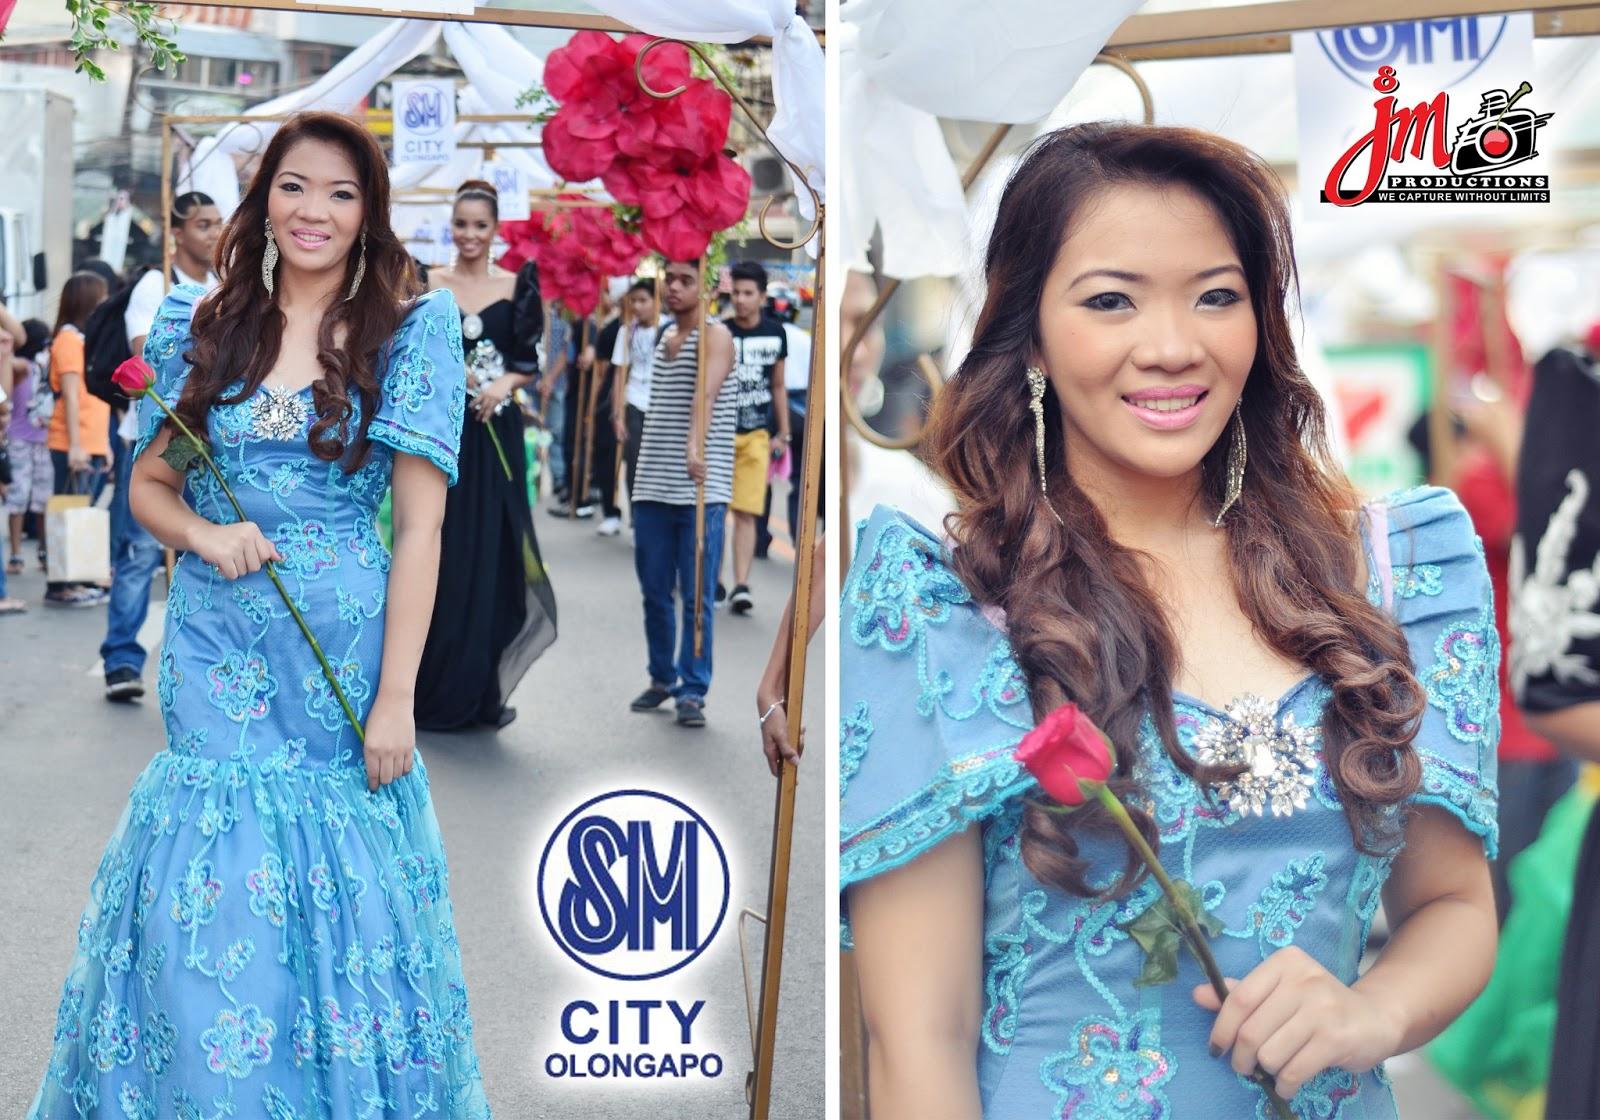 olongapo women